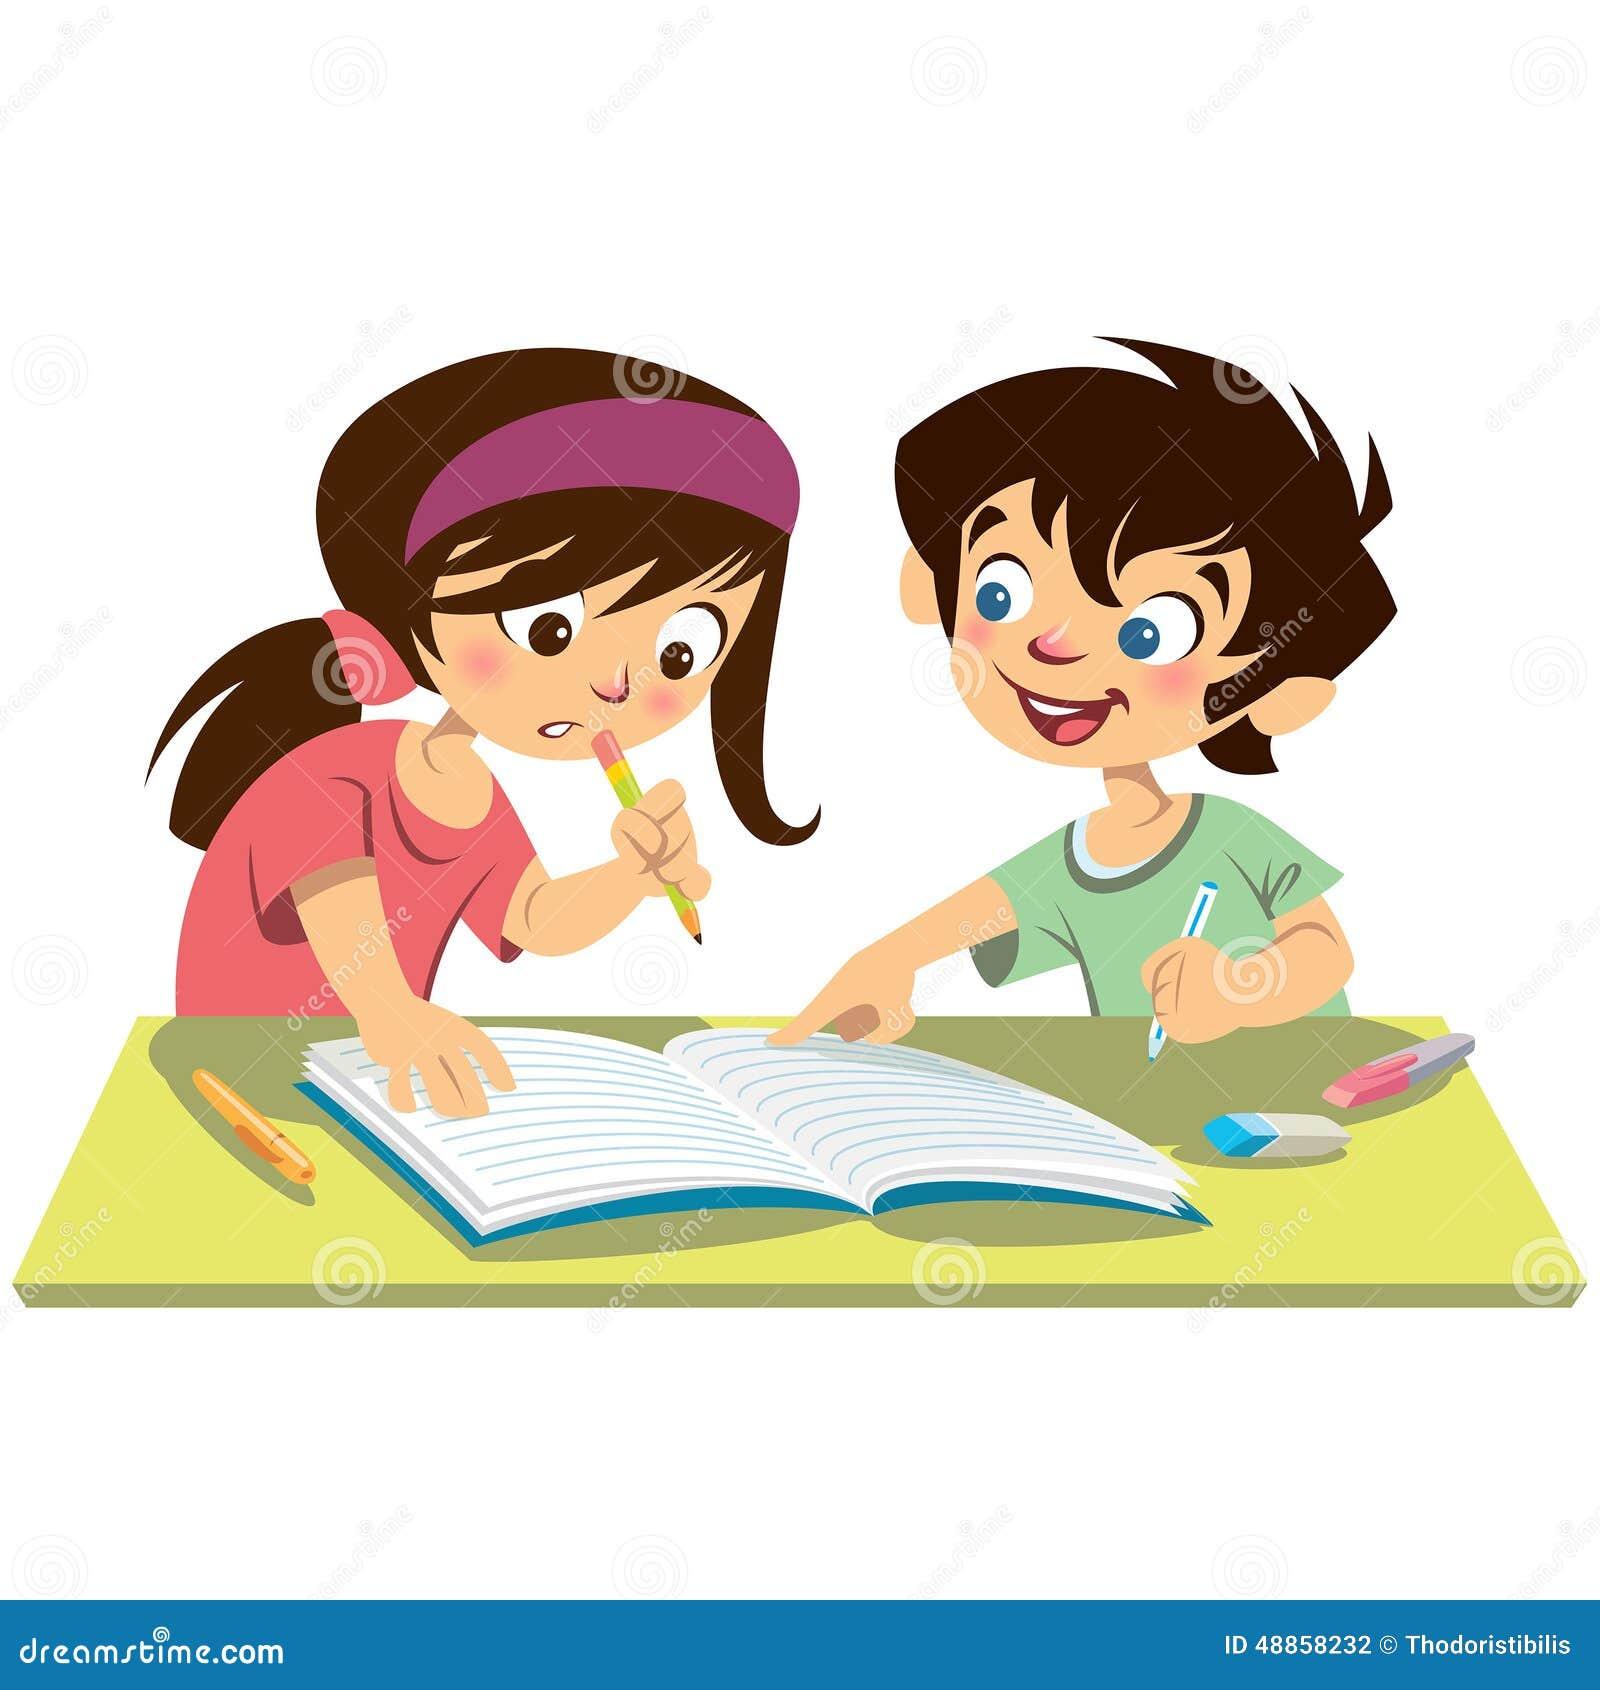 Boy seduces girl while studying